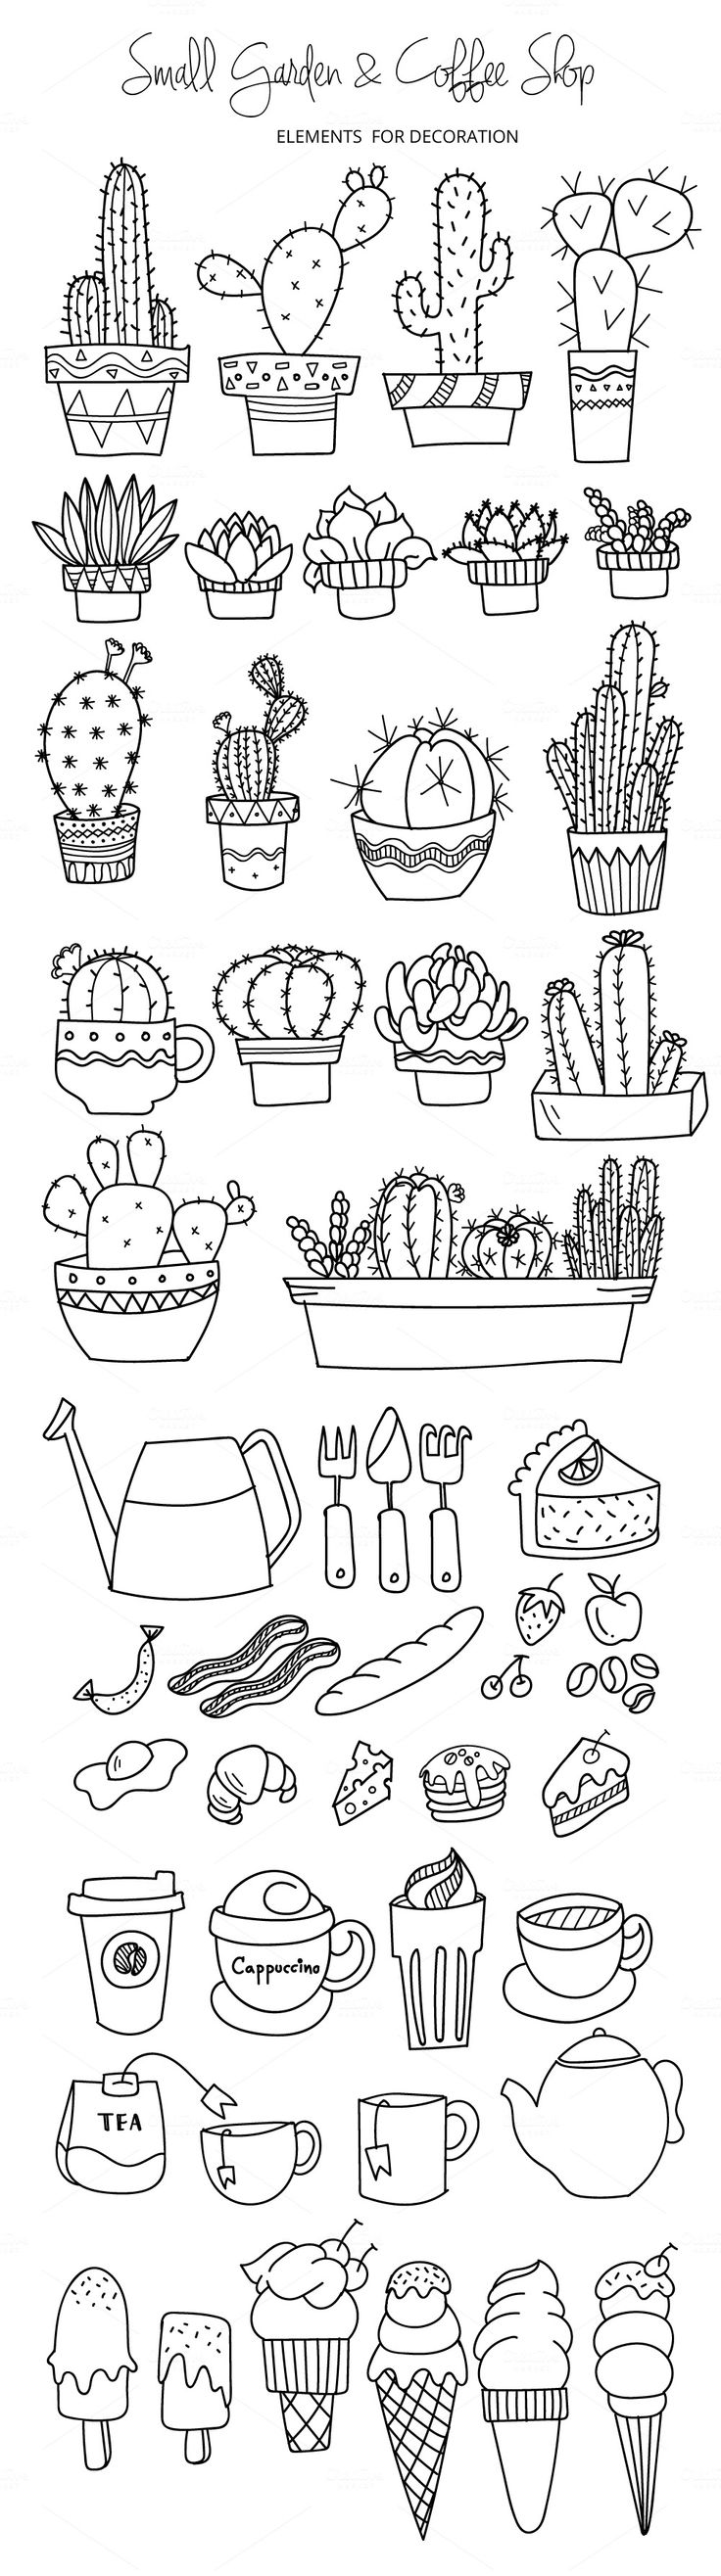 Curl clipart doodle Design (affiliate SO Clip This